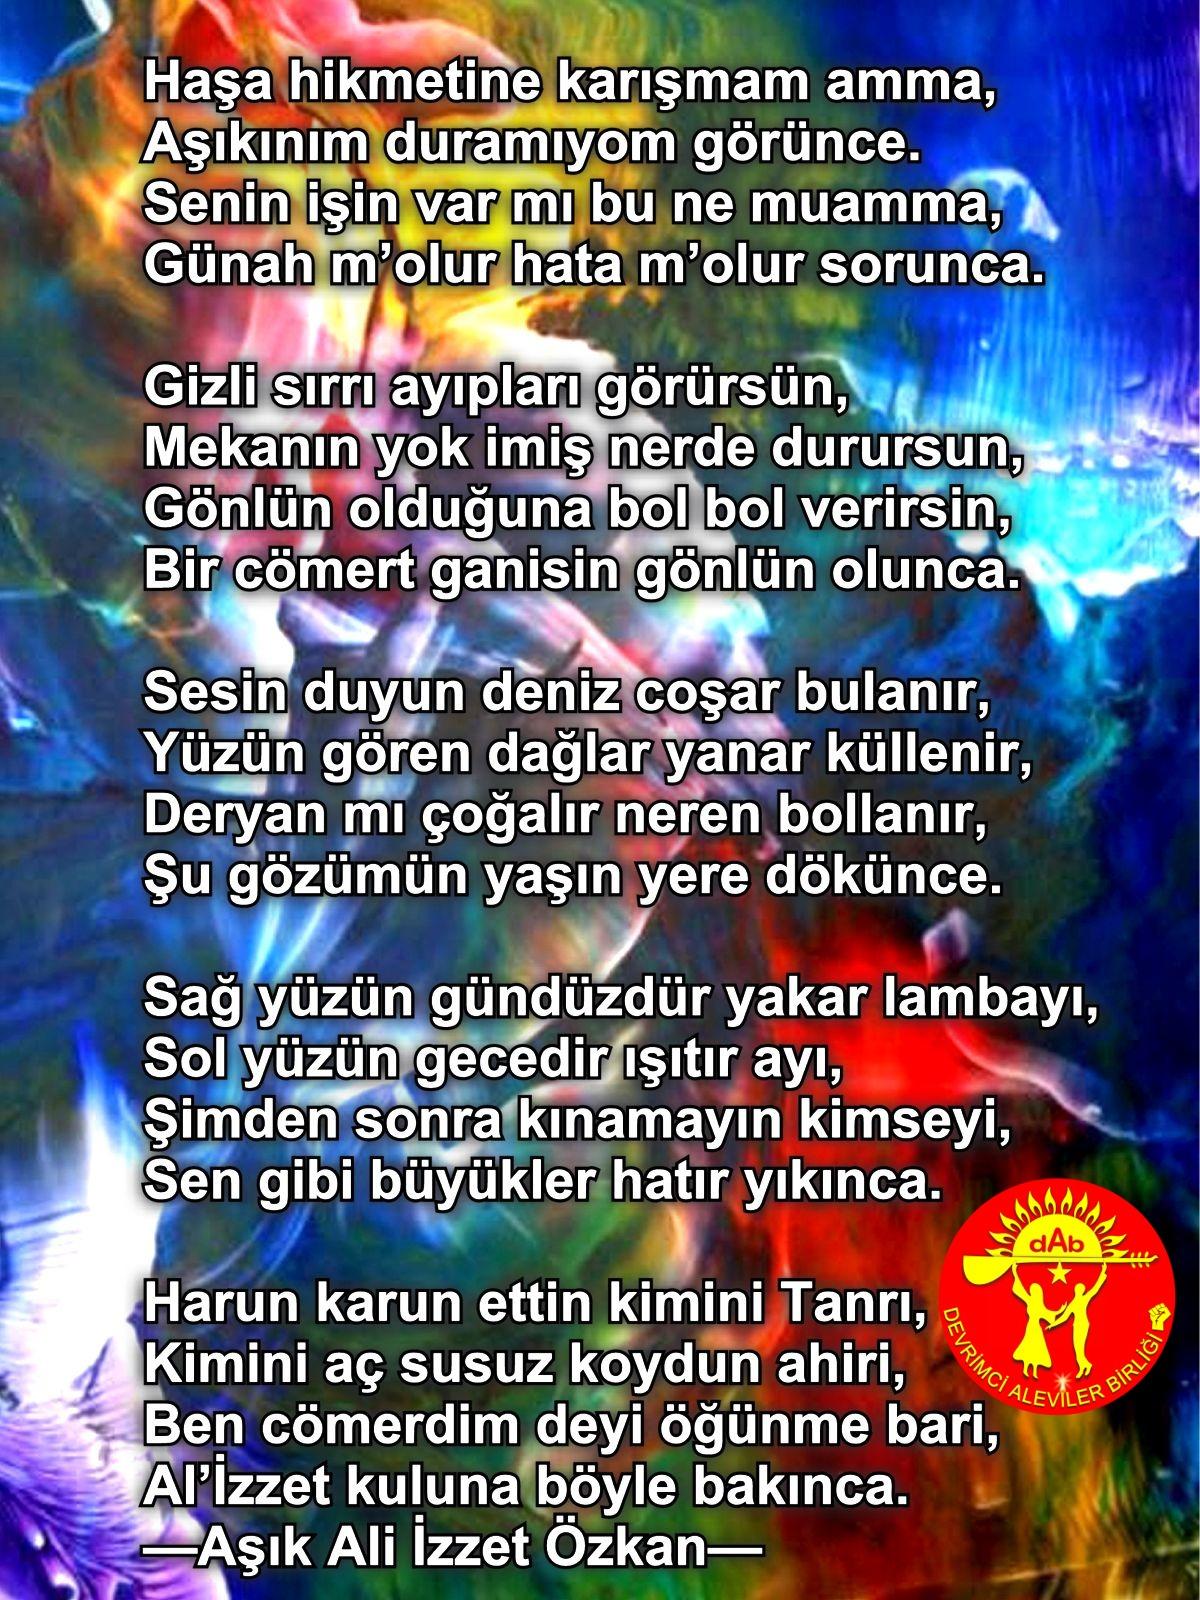 Alevi Bektaşi Kızılbaş Pir Sultan Devrimci Aleviler Birliği DAB tanri